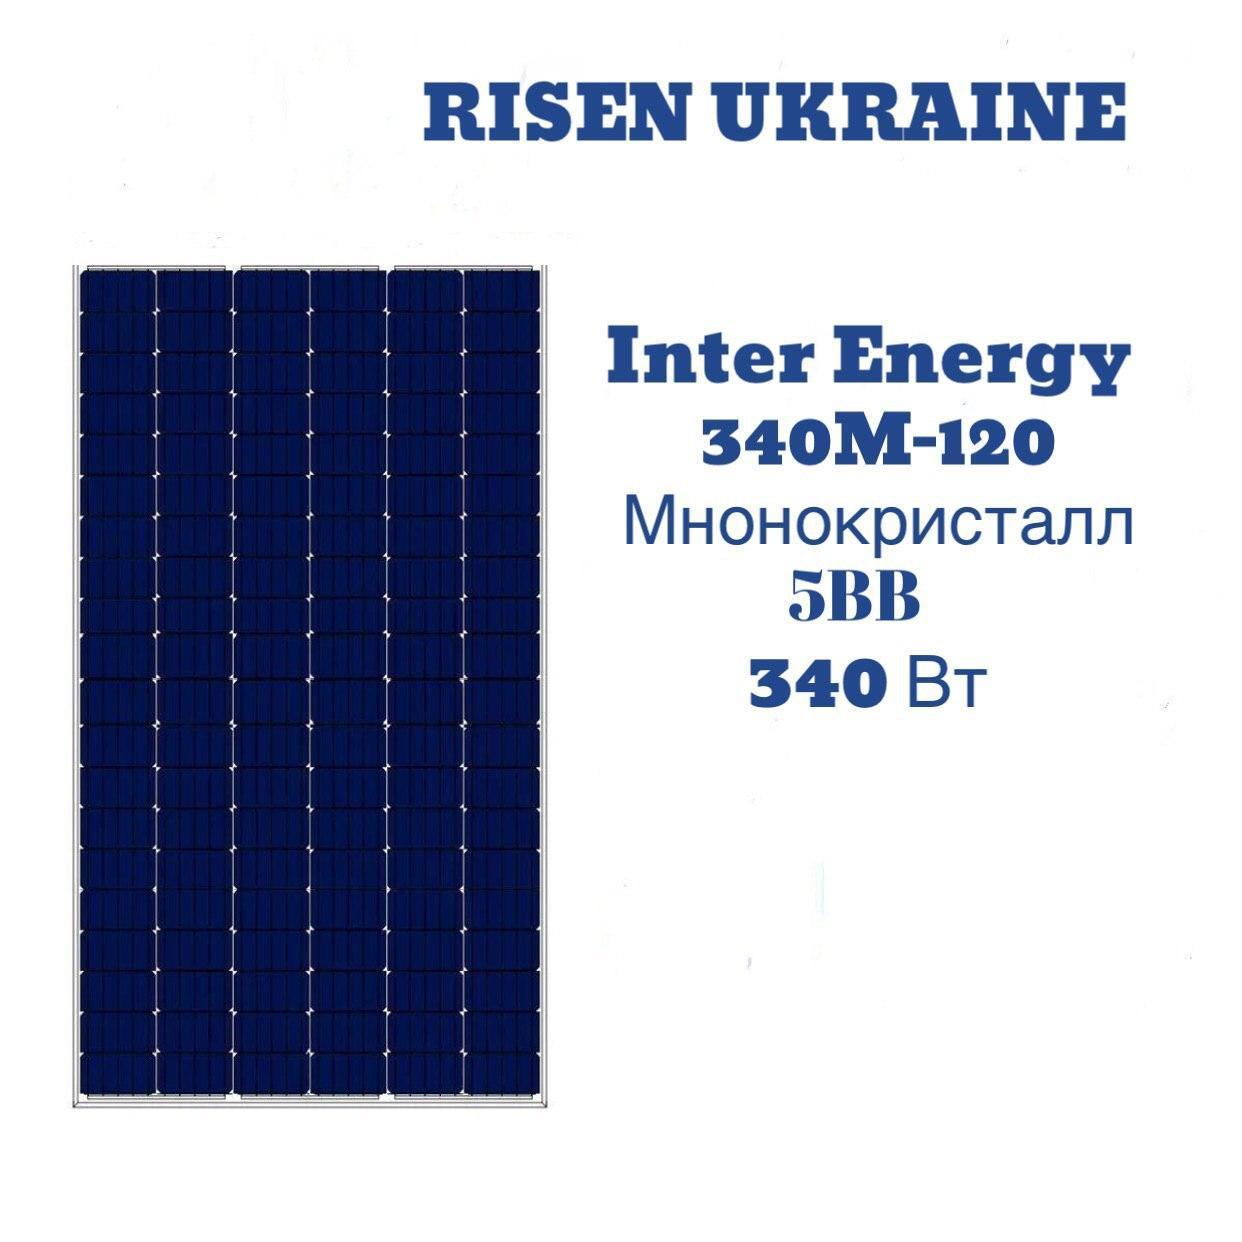 Солнечная батарея INTEREnergy IЕ-M120-340W/5ВВ монокристалл 340Вт